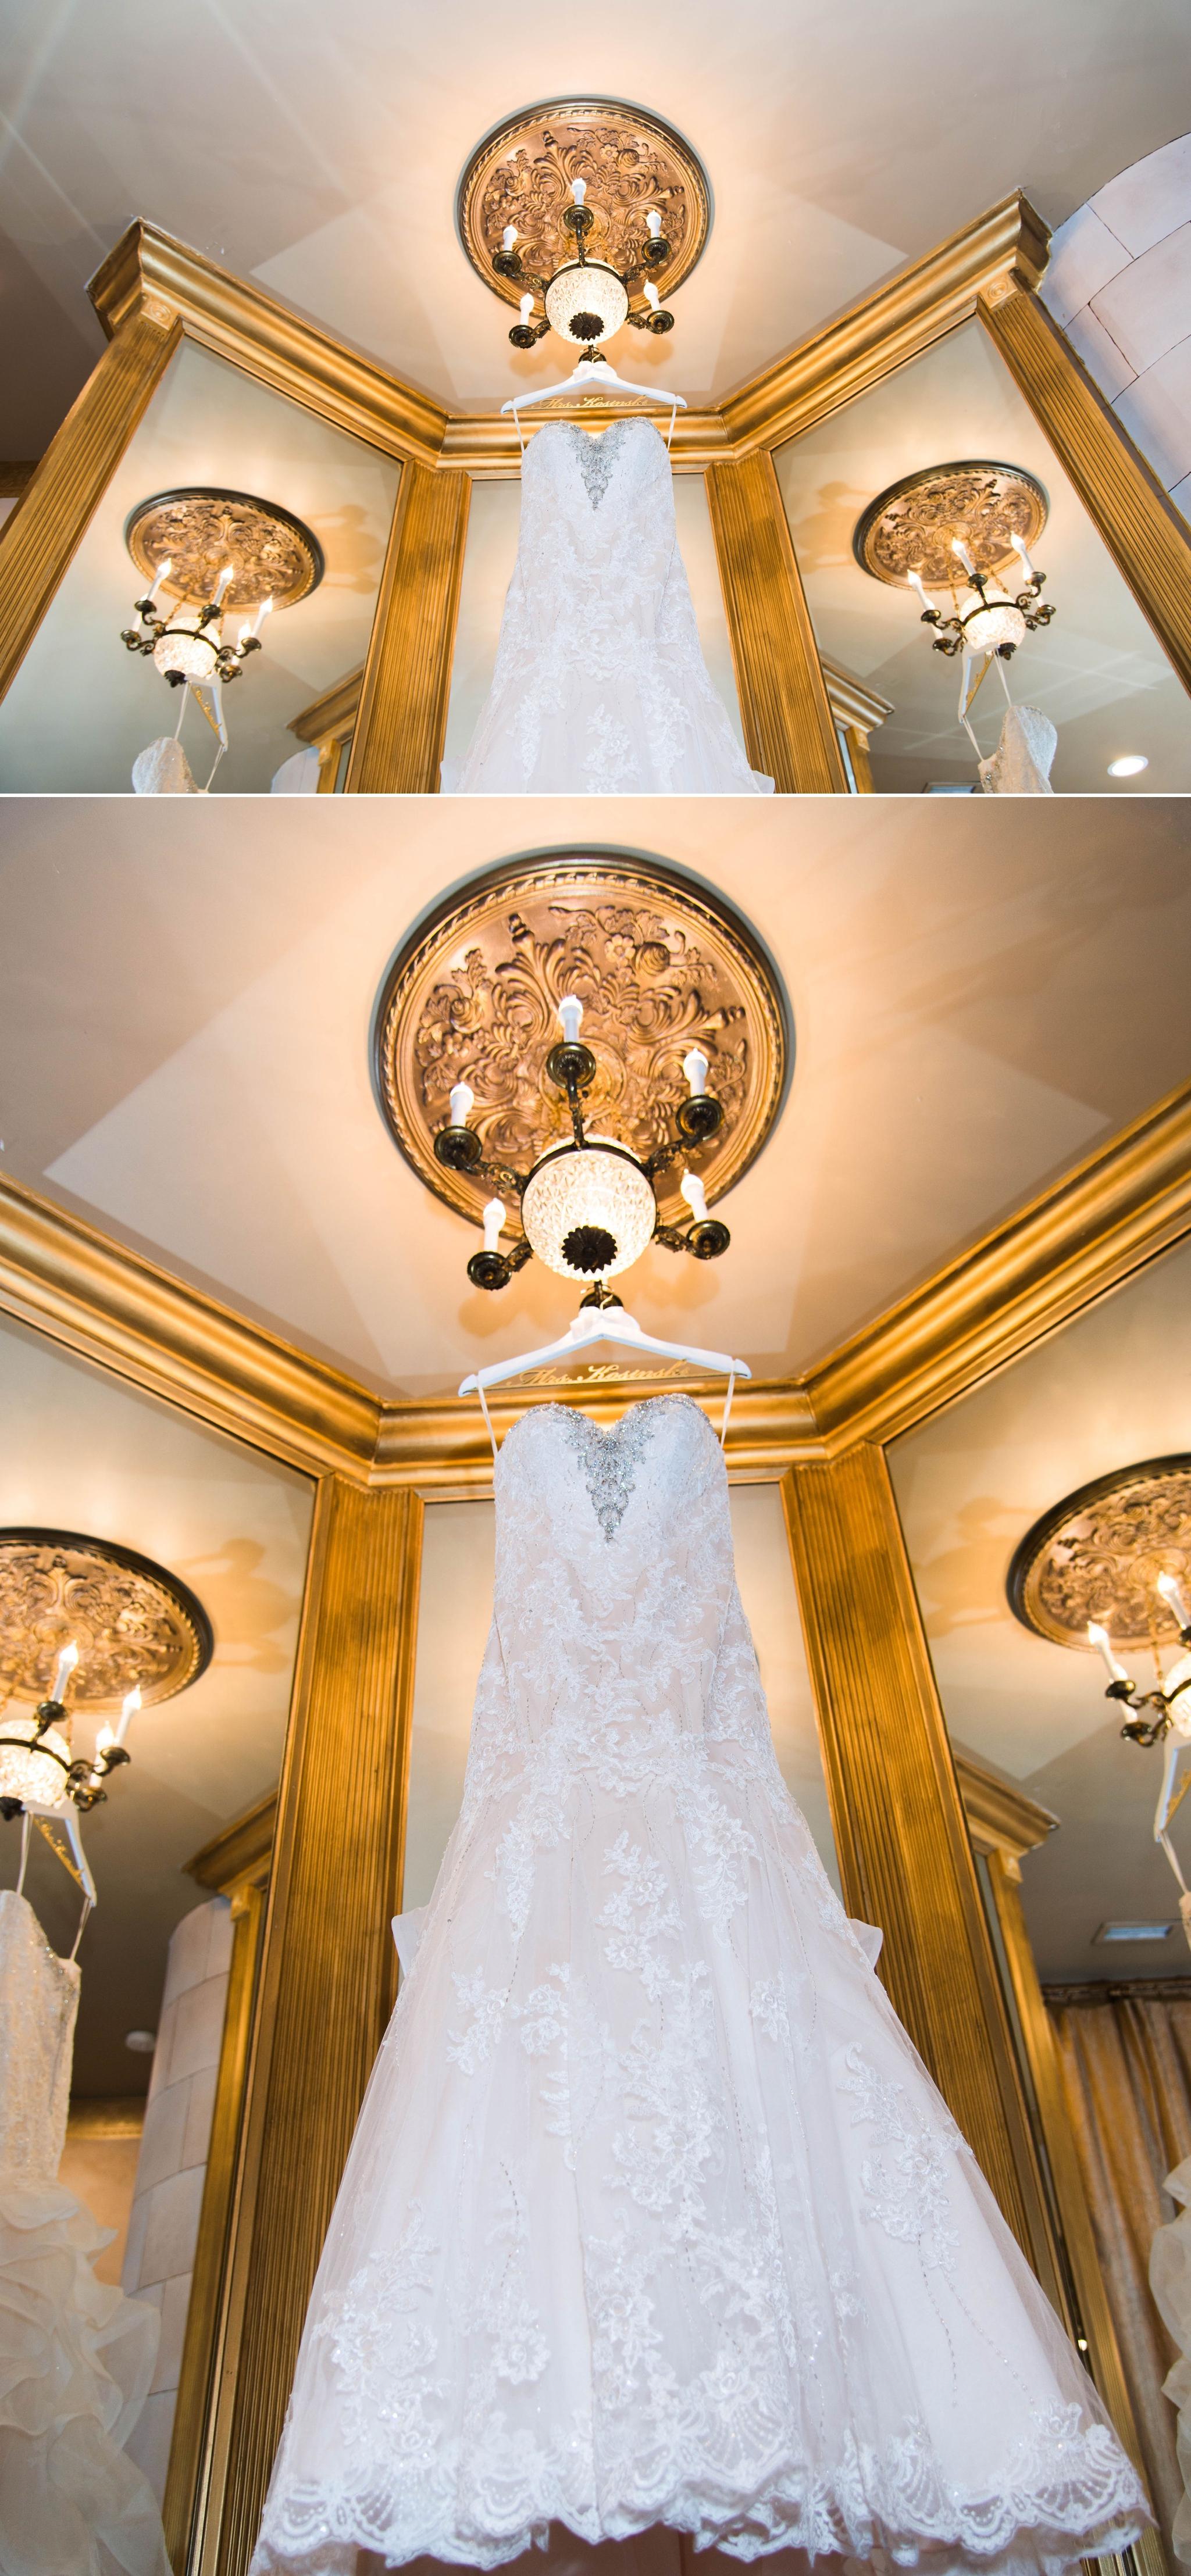 luxury wedding gown bridal details - - Honolulu Oahu Hawaii Wedding Photographer